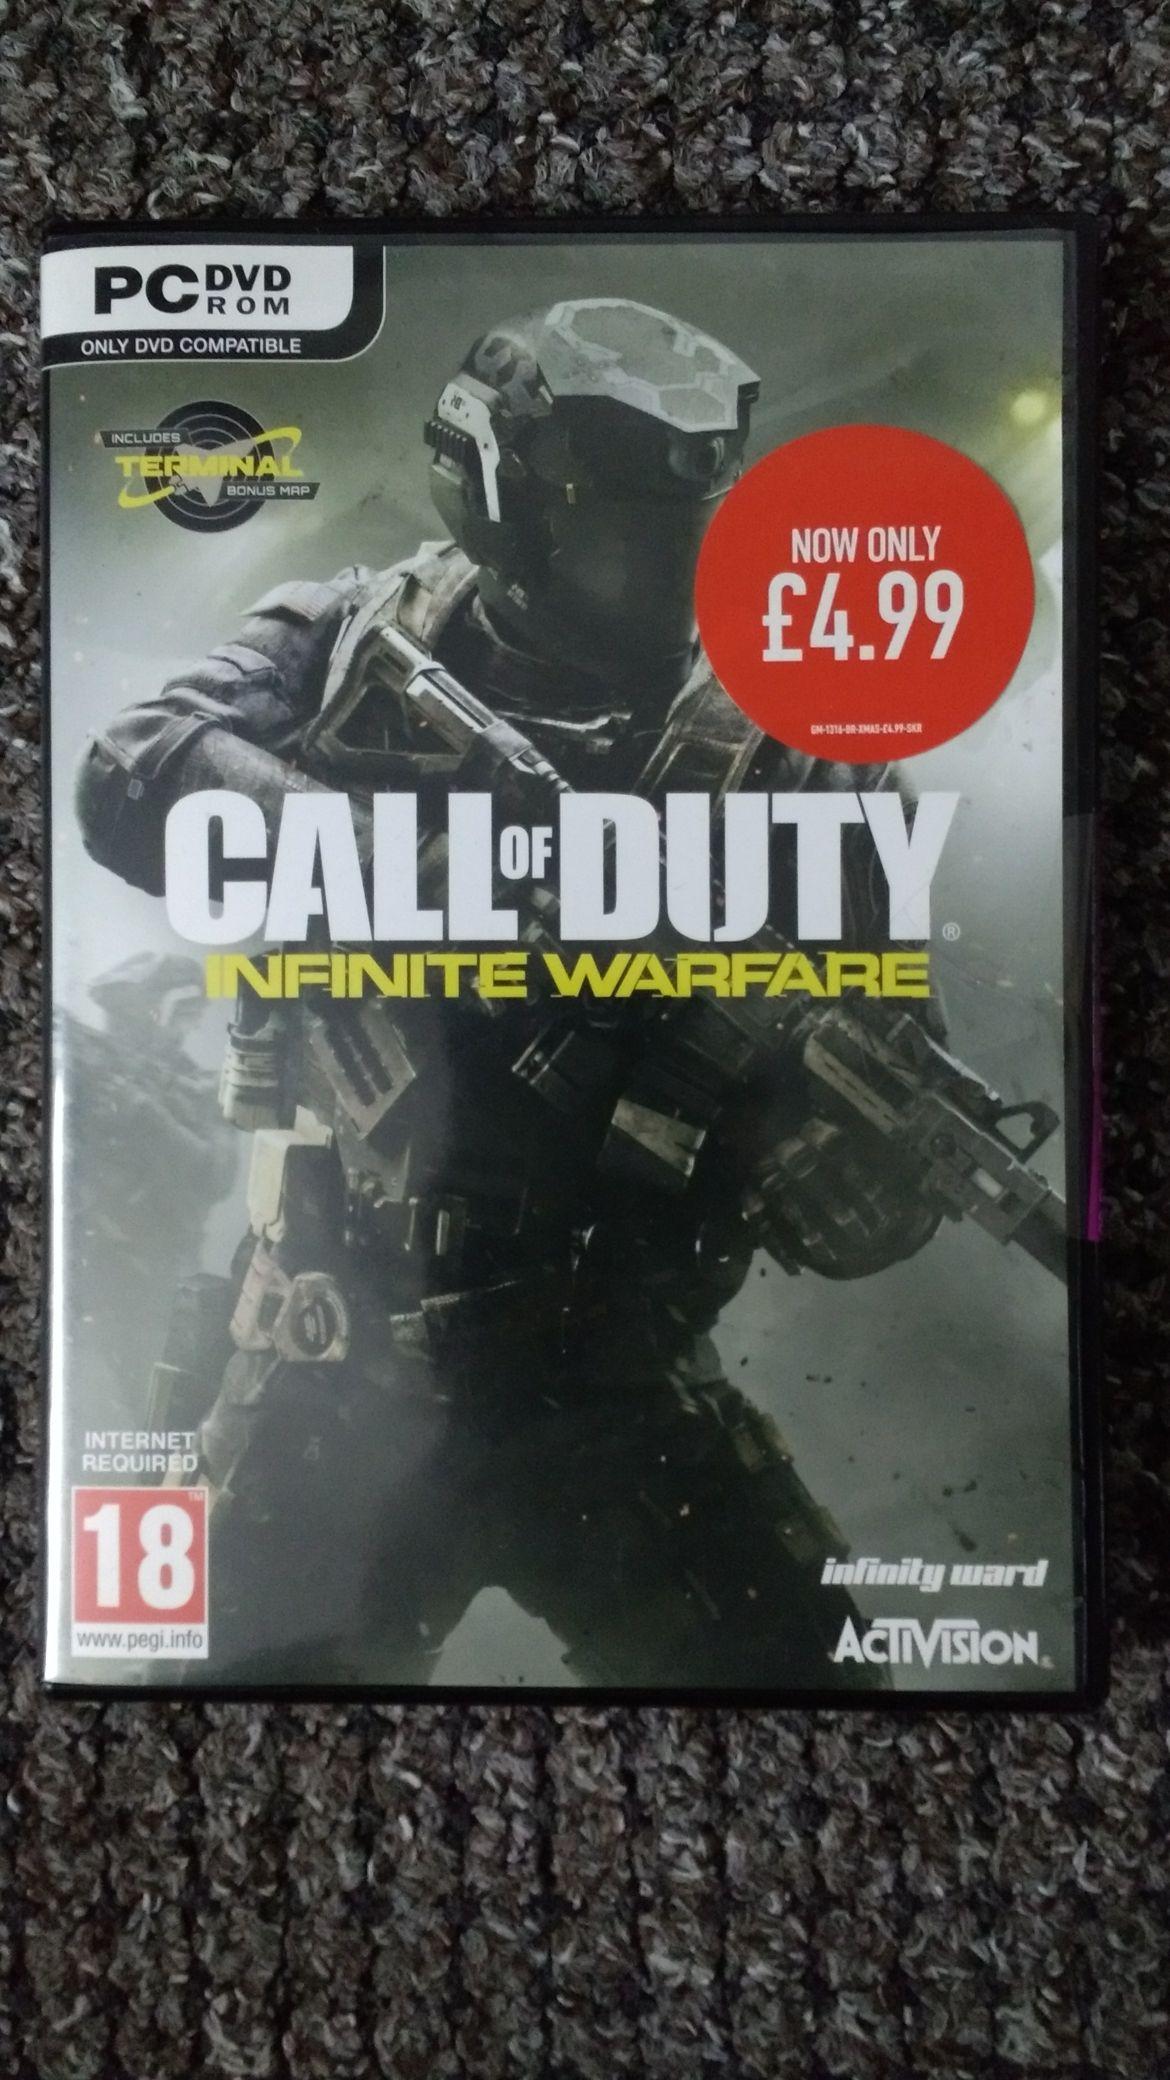 PC DVD Call of Duty Infinite Warfare £4.99 GAME